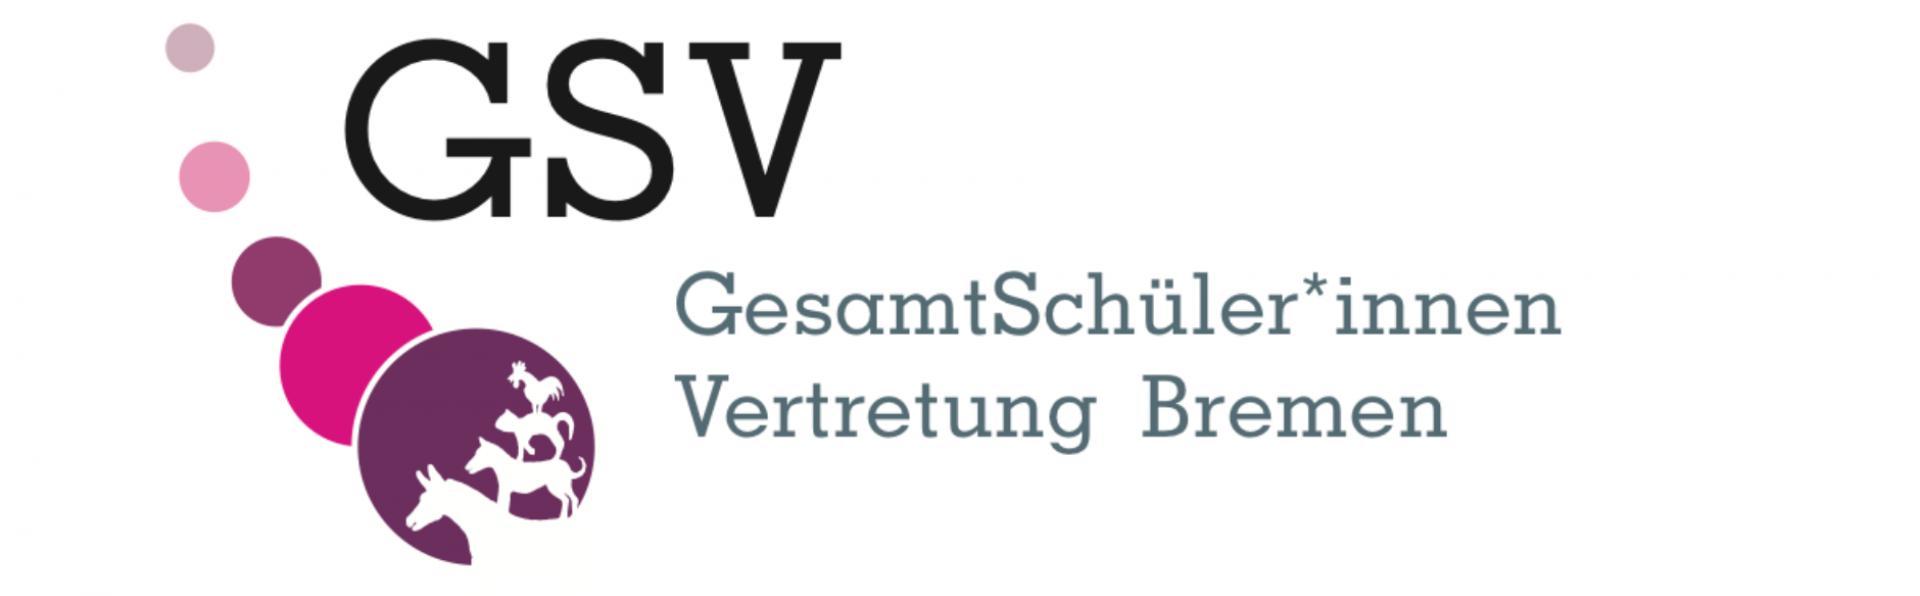 Gesamtschüler*innenvertretung Bremen